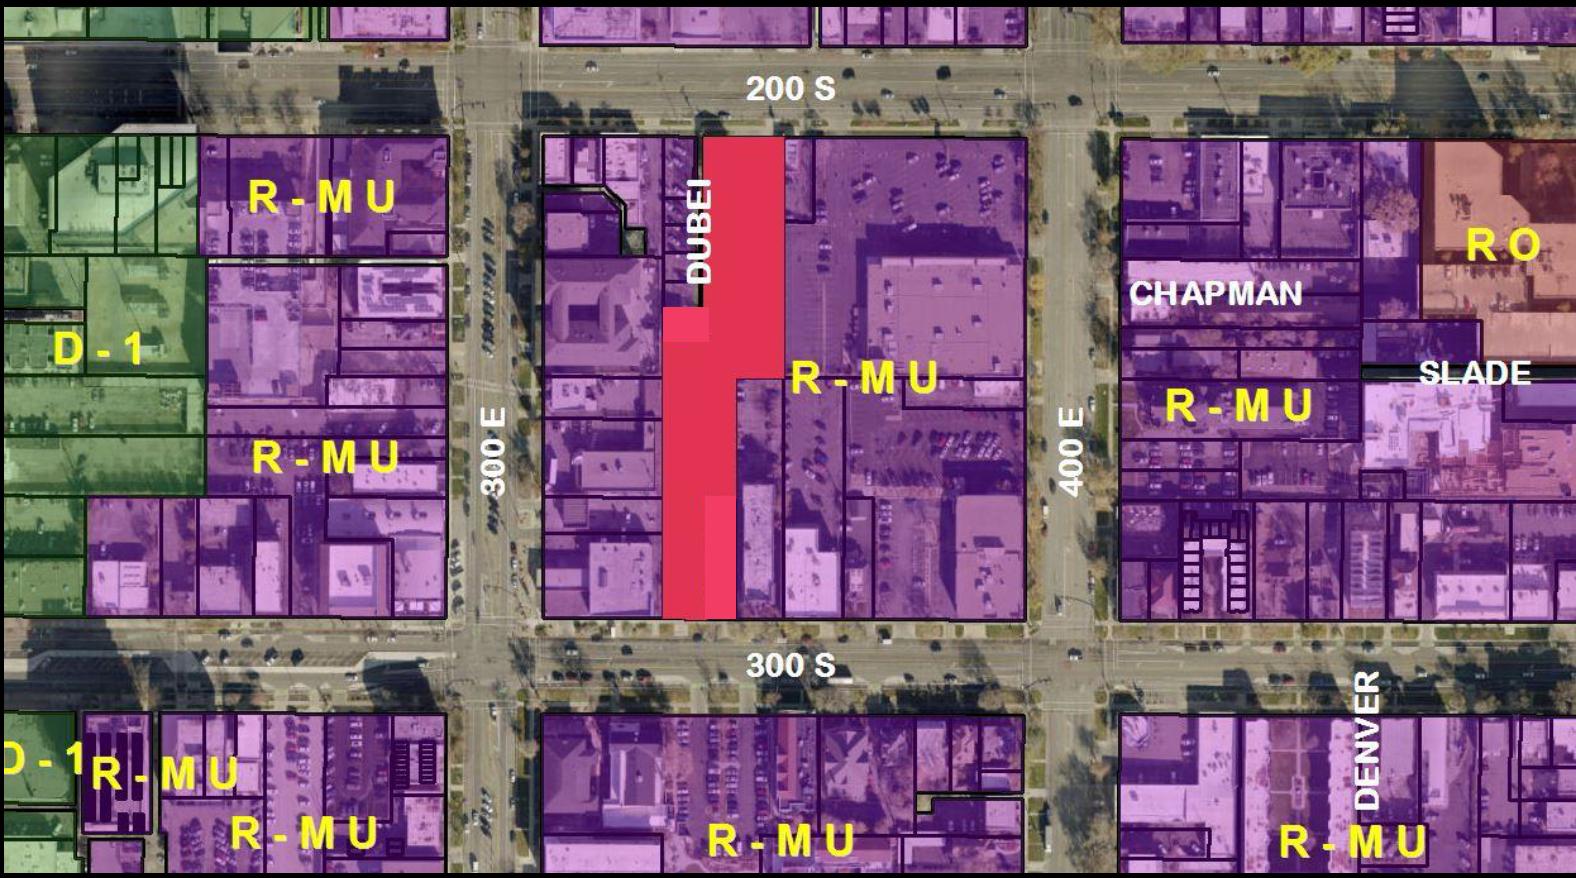 Broadway Apartments zoning map - Building Salt Lake on